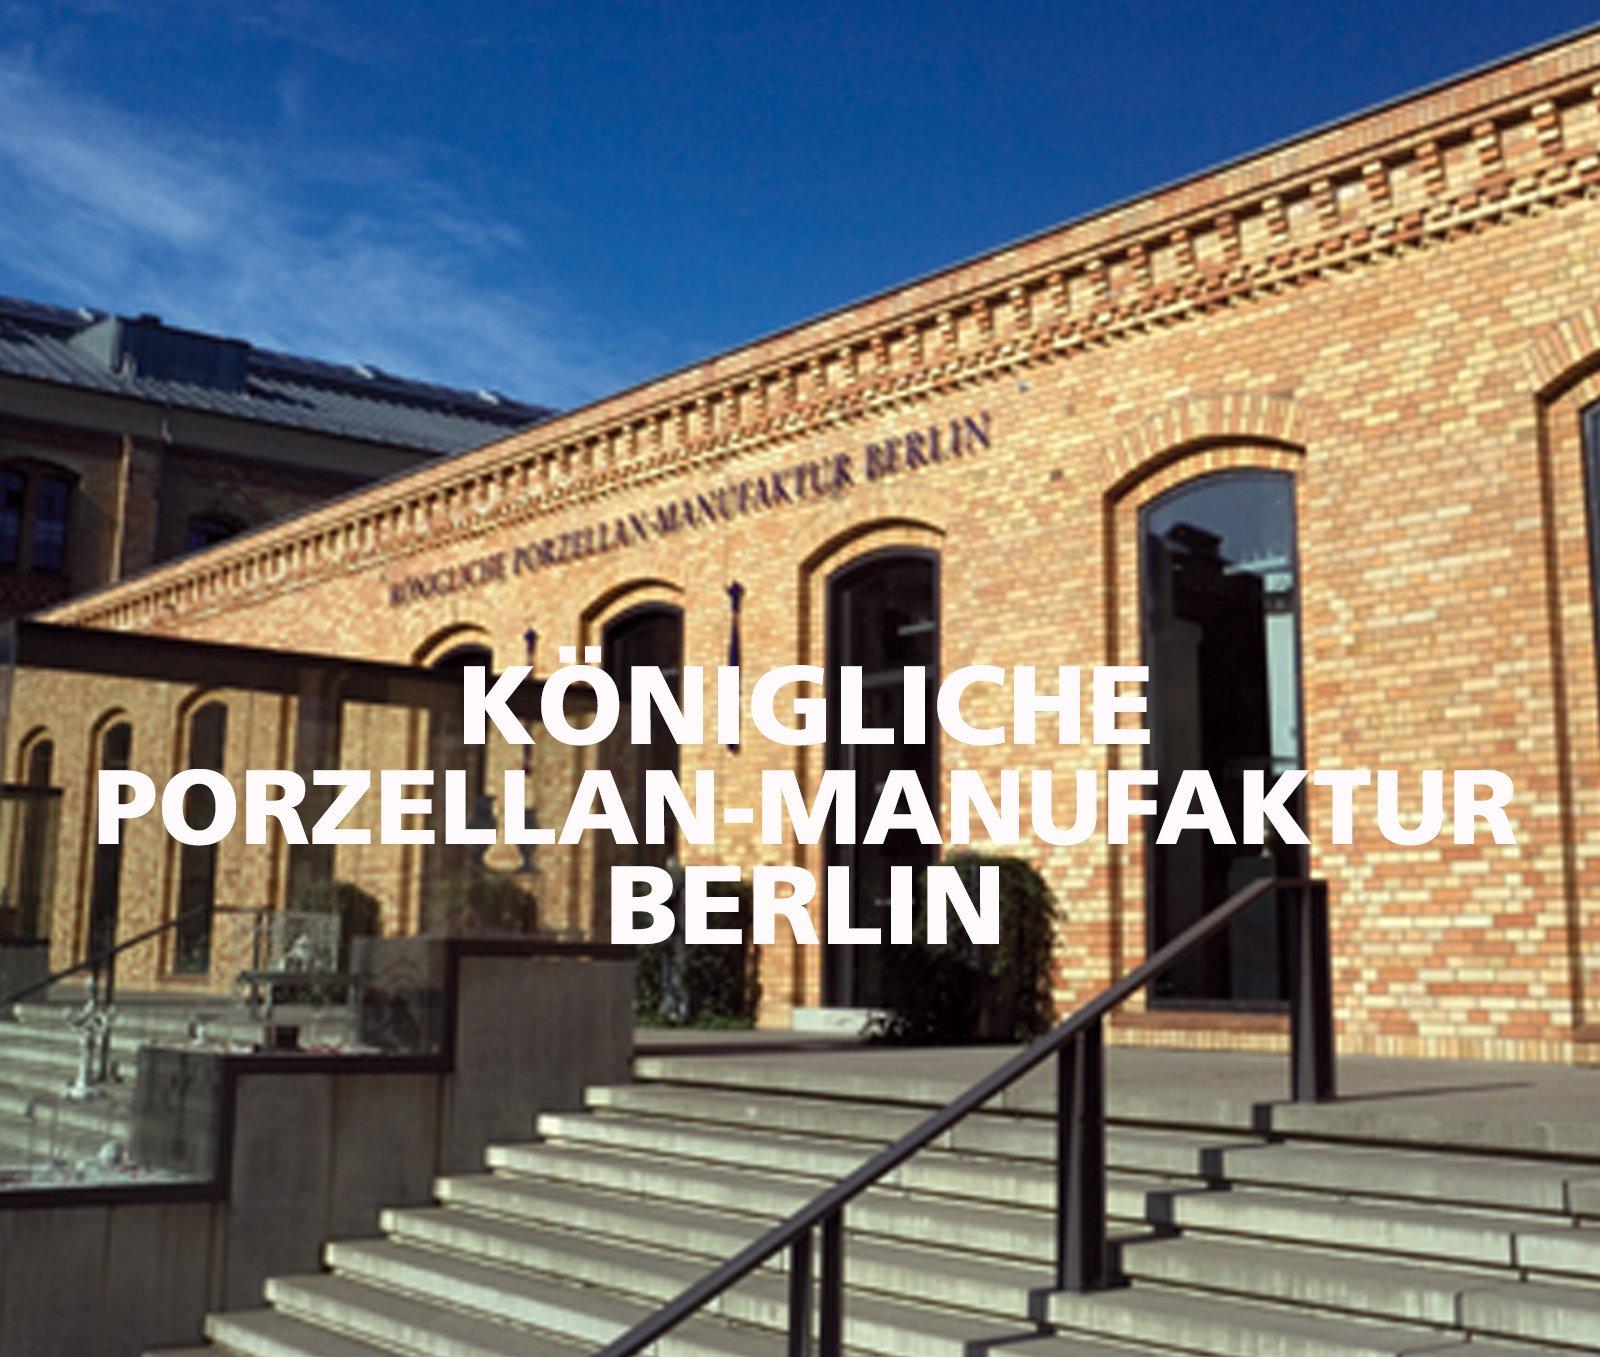 FLORIS Catering Königliche Porzellan-Manufaktur Berlin